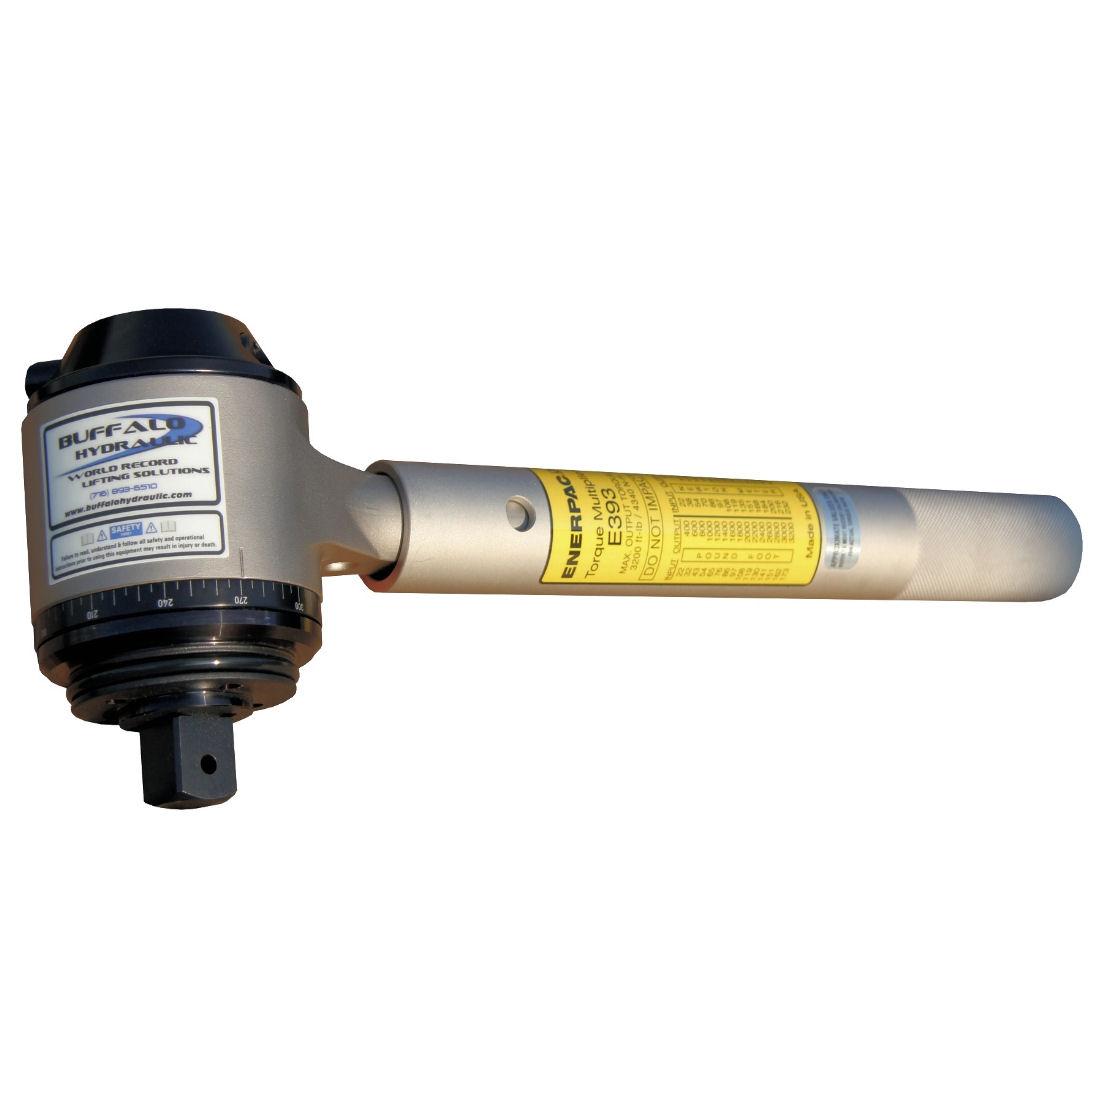 Hydraulic torque multiplier water line flex hose